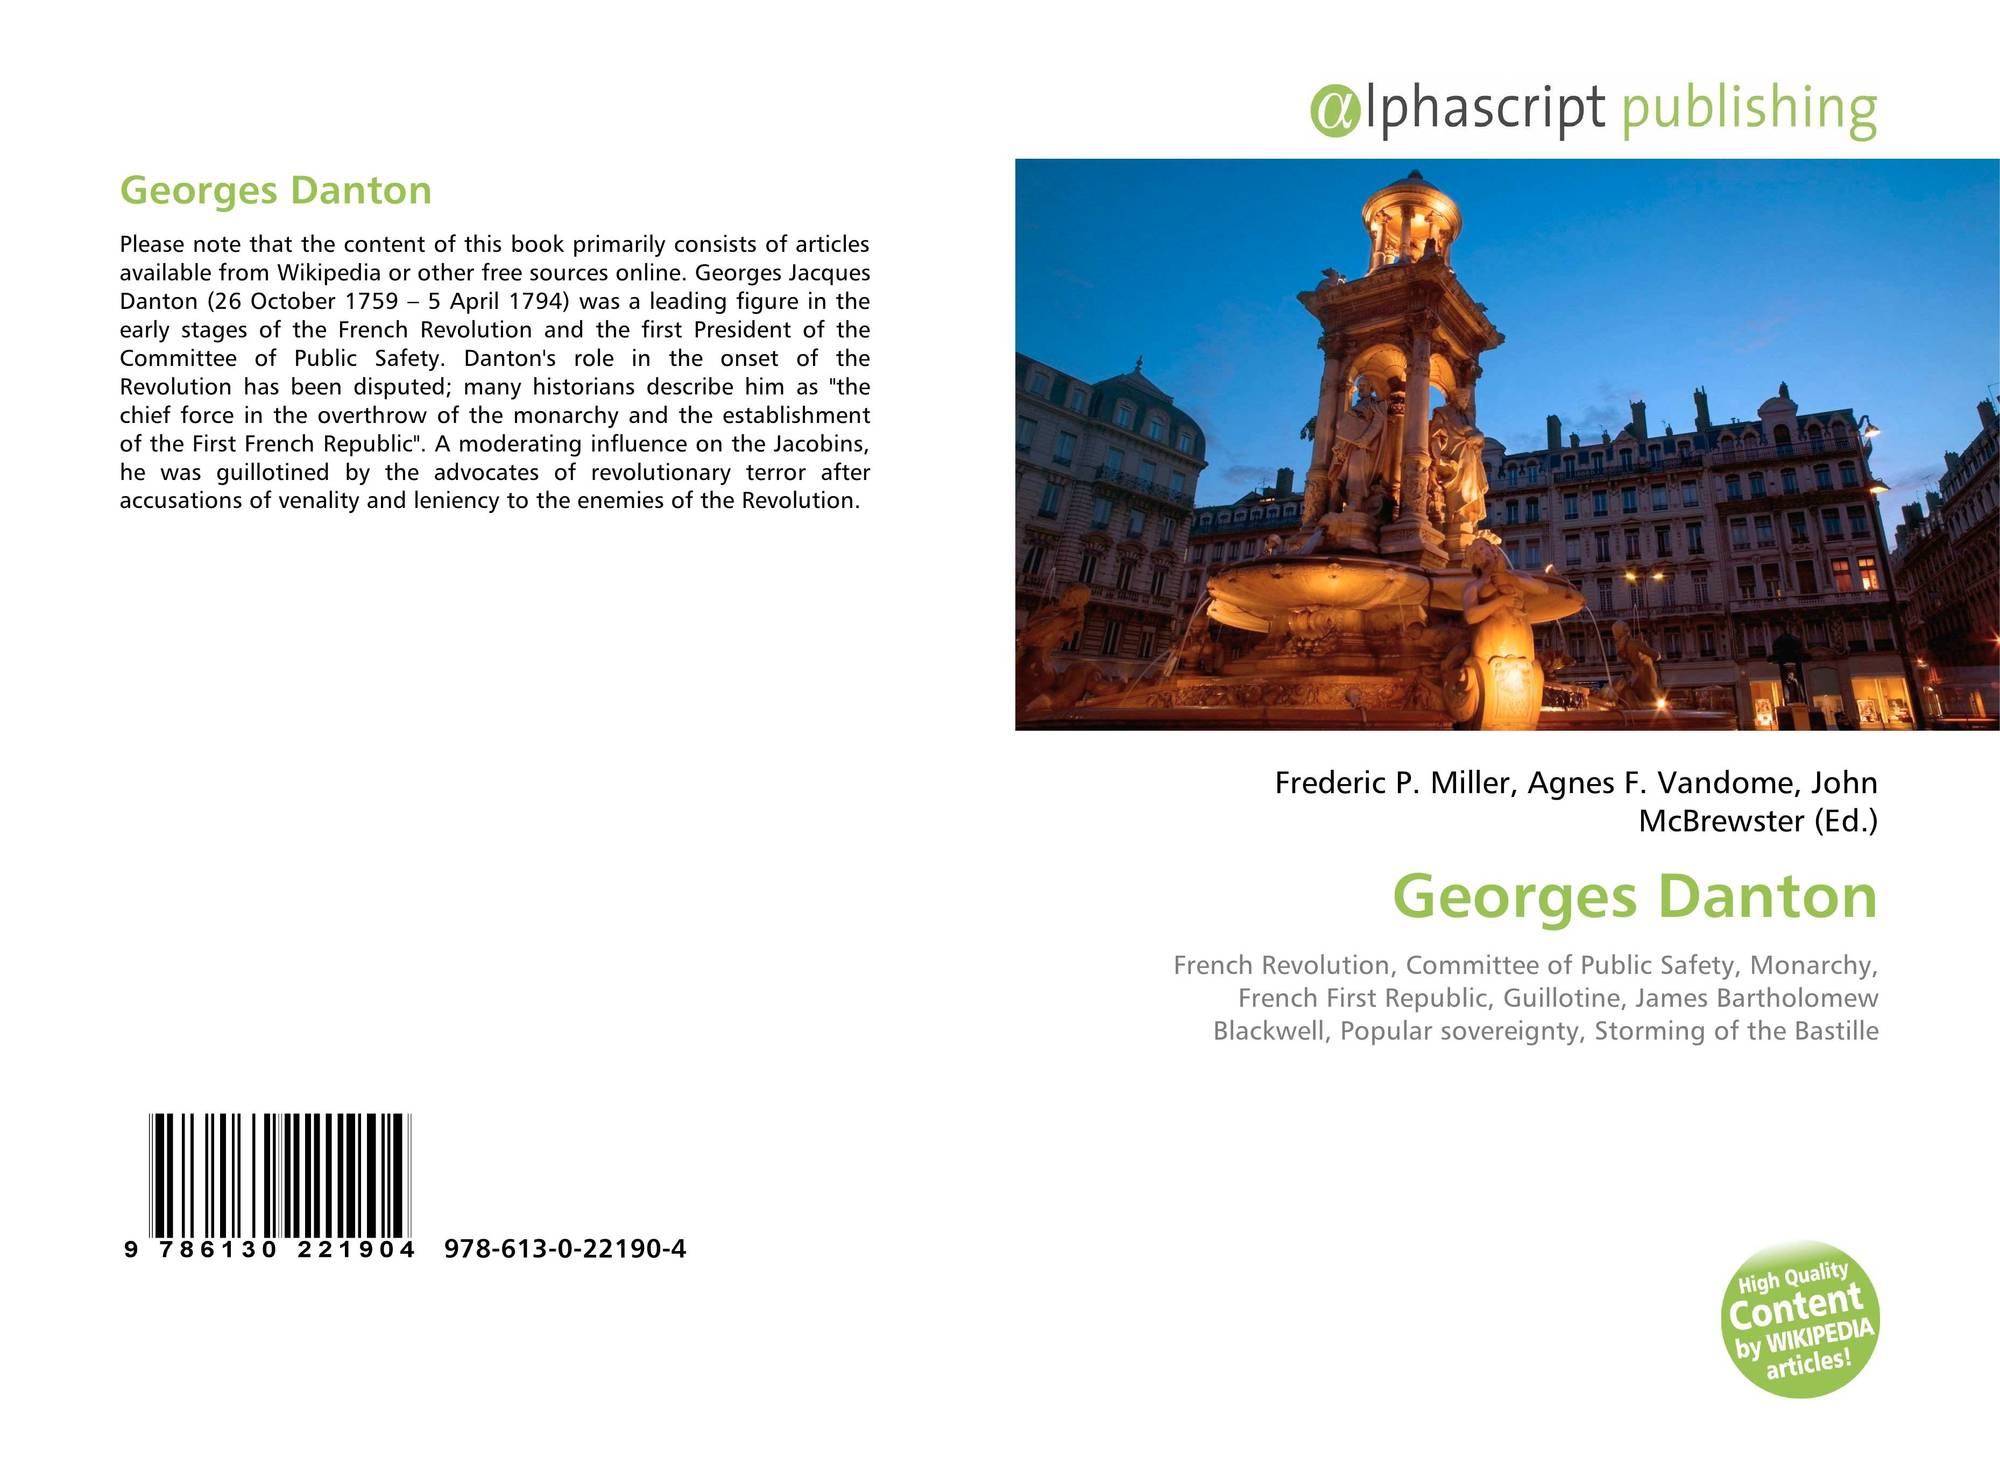 Georges Danton georges danton, 978-613-0-22190-4, 6130221908 ,9786130221904